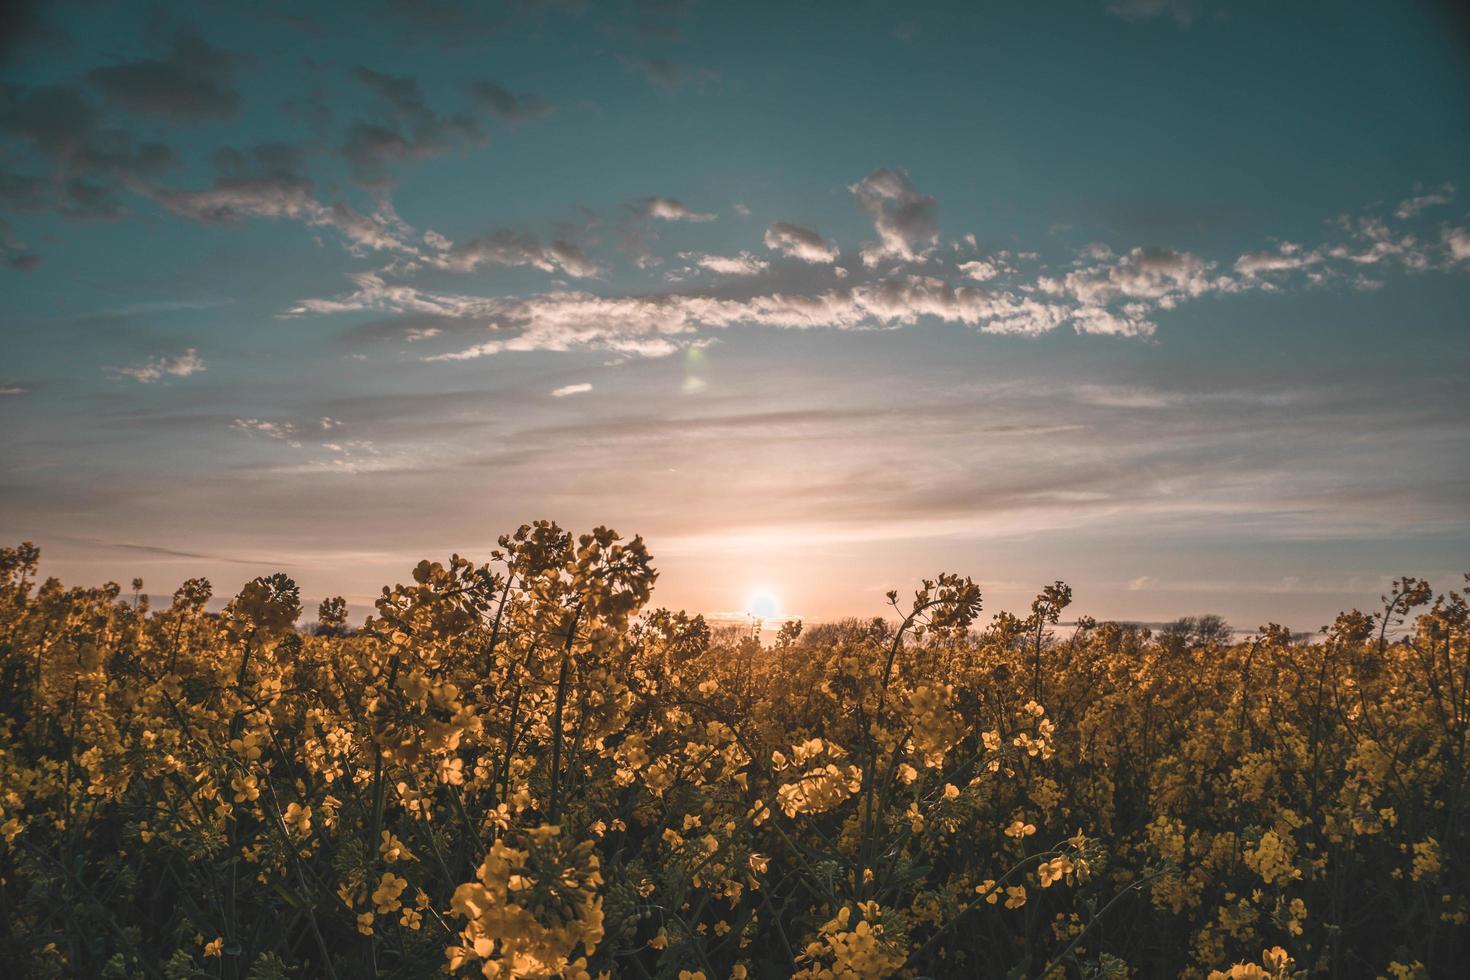 Yellow flower field at sunset photo